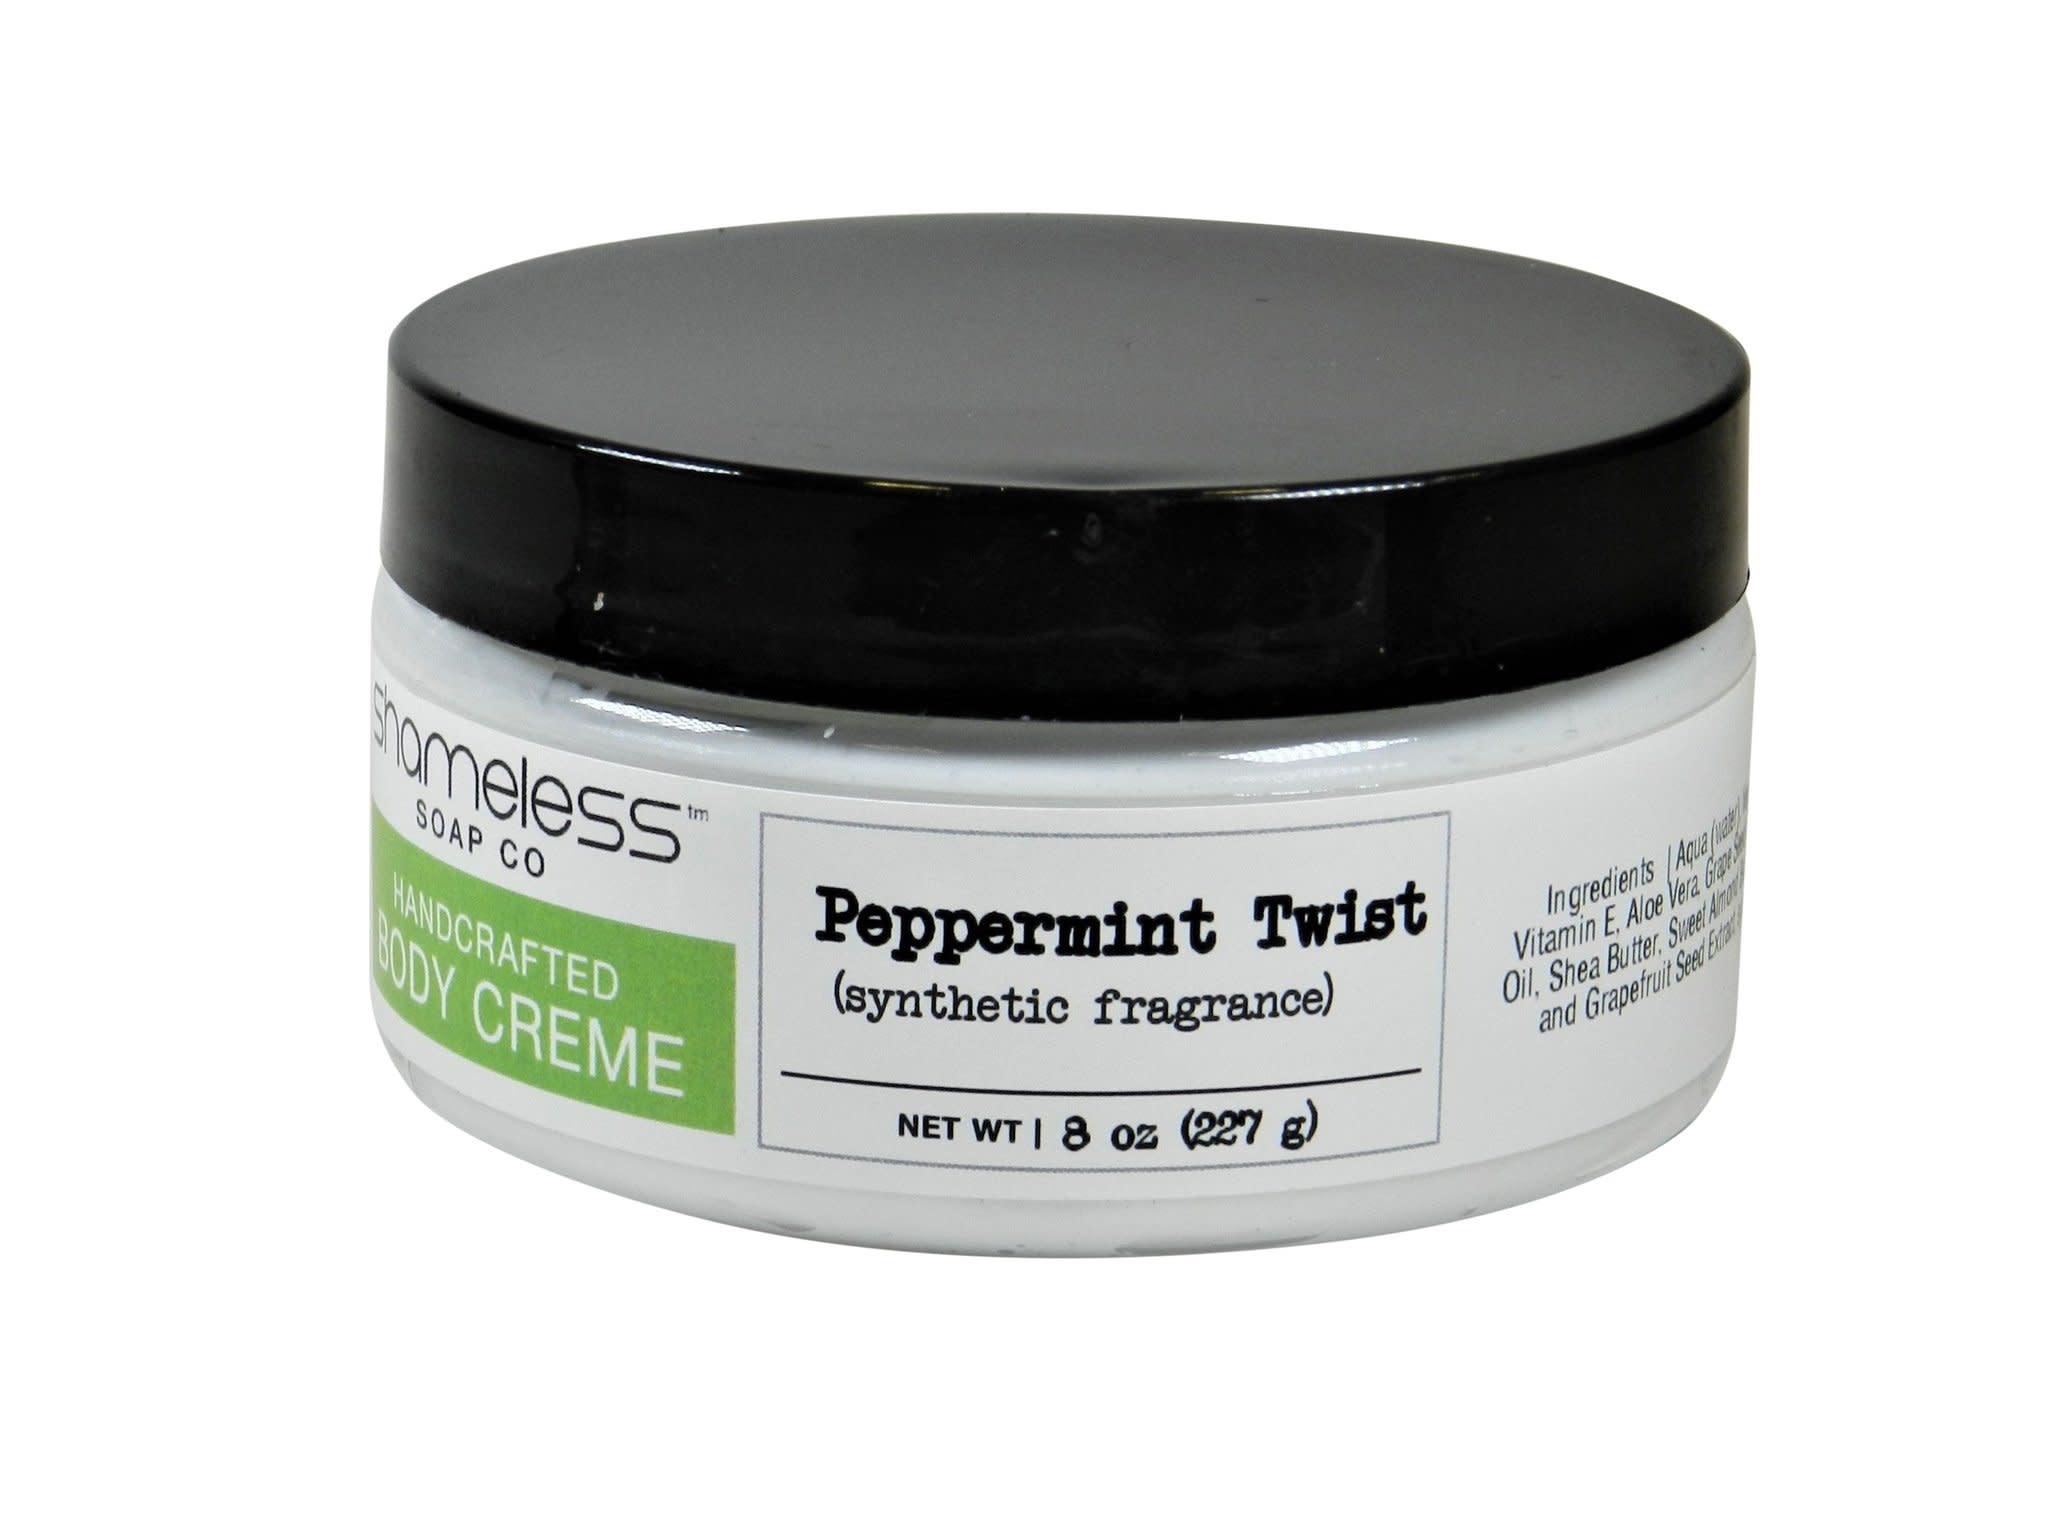 Peppermint Twist Body Creme